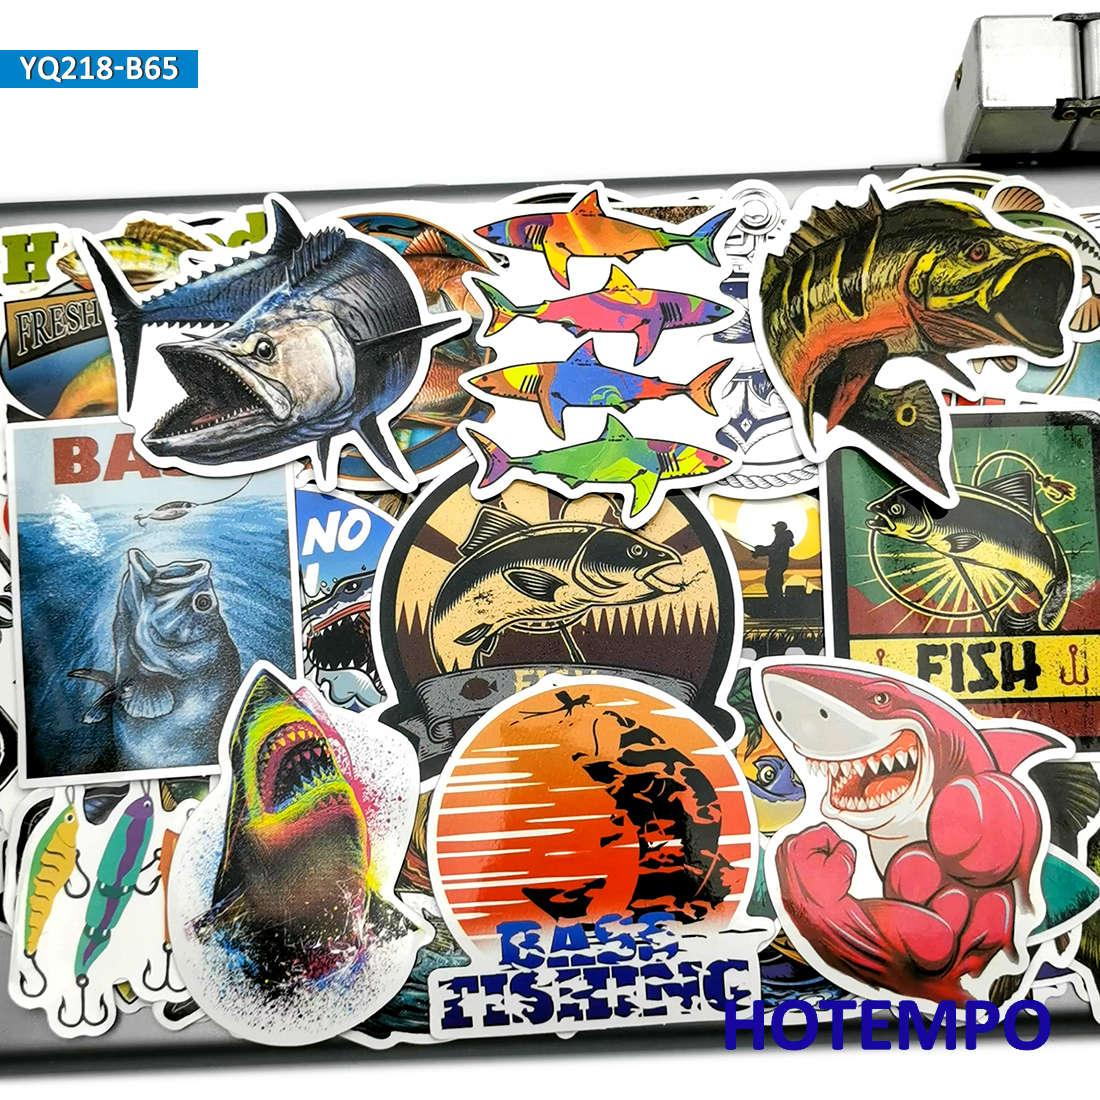 65pcs Outdoors Fisherman Go Fishing Fashion Fish Stickers For Mobile Phone Laptop Luggage Skateboard Box Tank Bucket Art Sticker